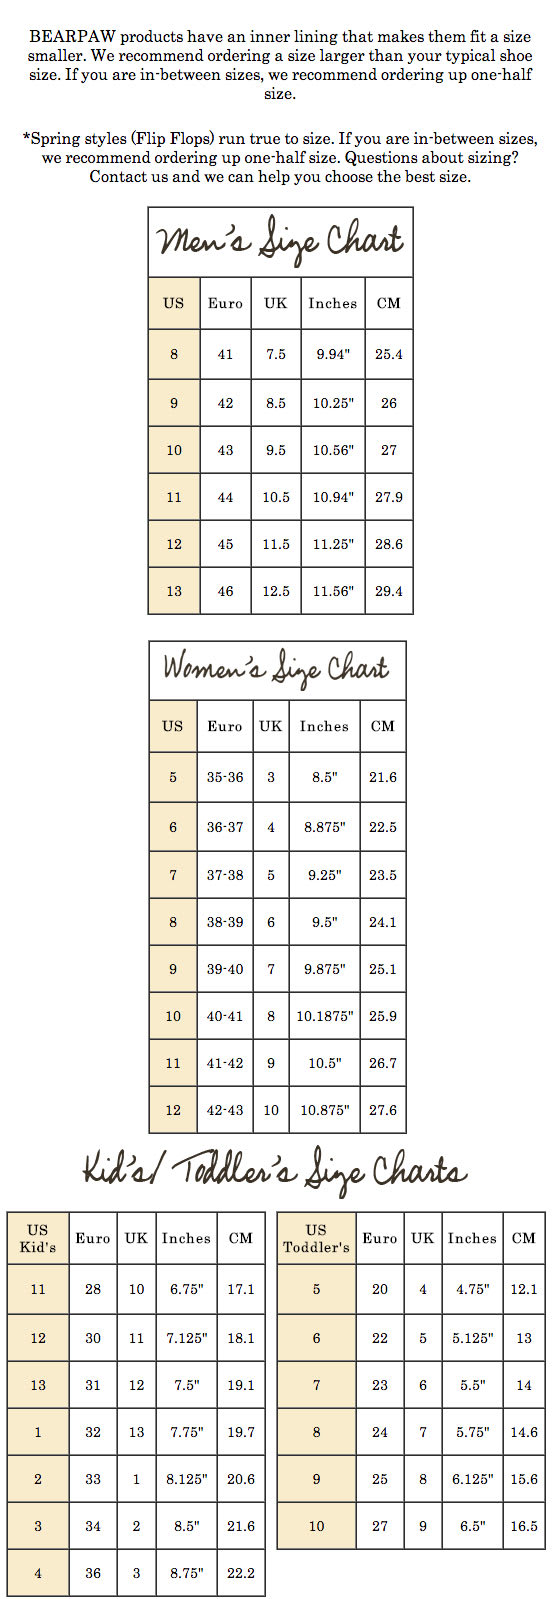 White Sierra Size Chart